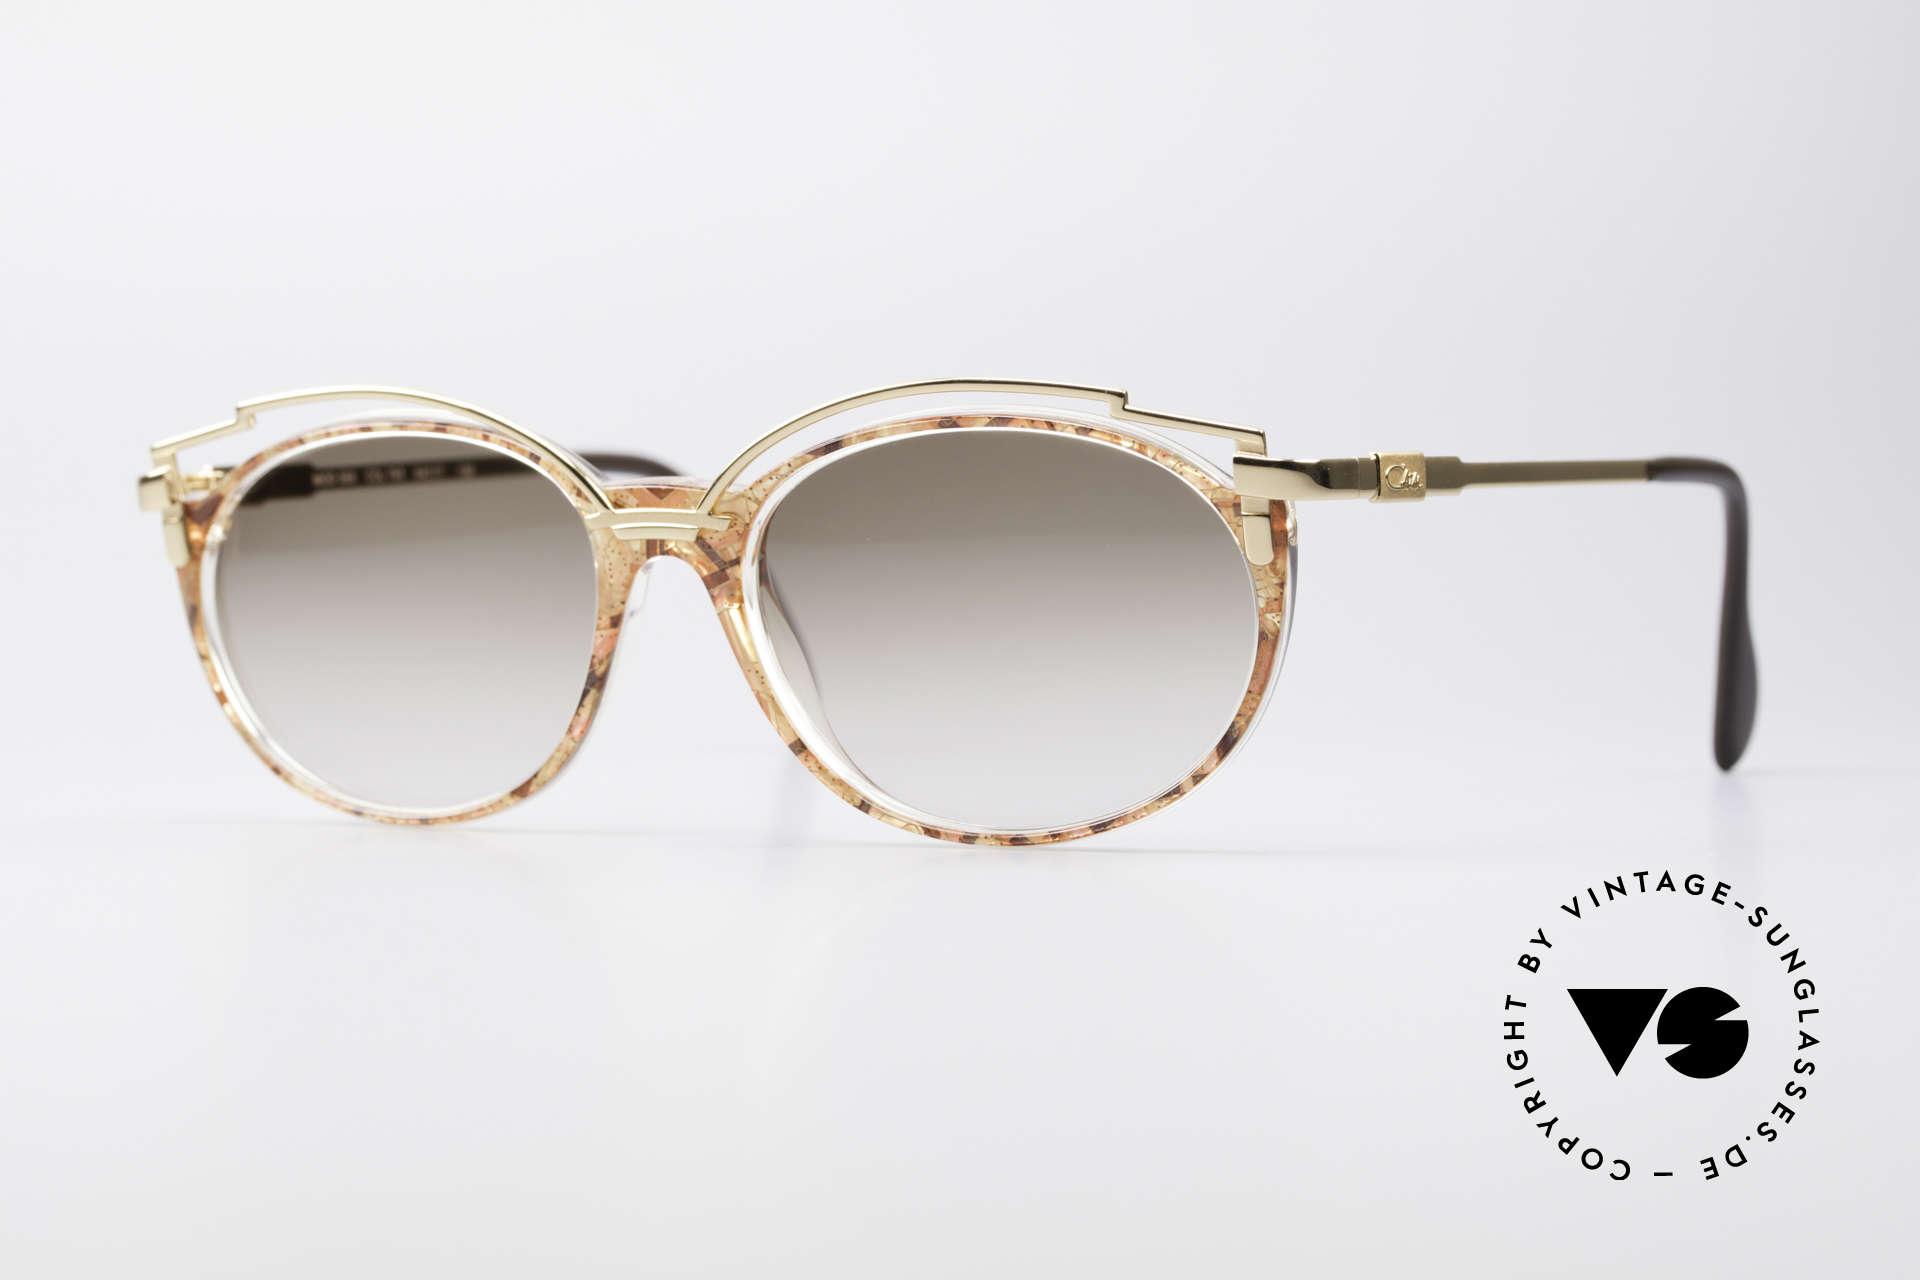 Cazal 358 90's Ladies Sunglasses Vintage, enchanting VINTAGE sunglasses from 1996 by CAZAL, Made for Women